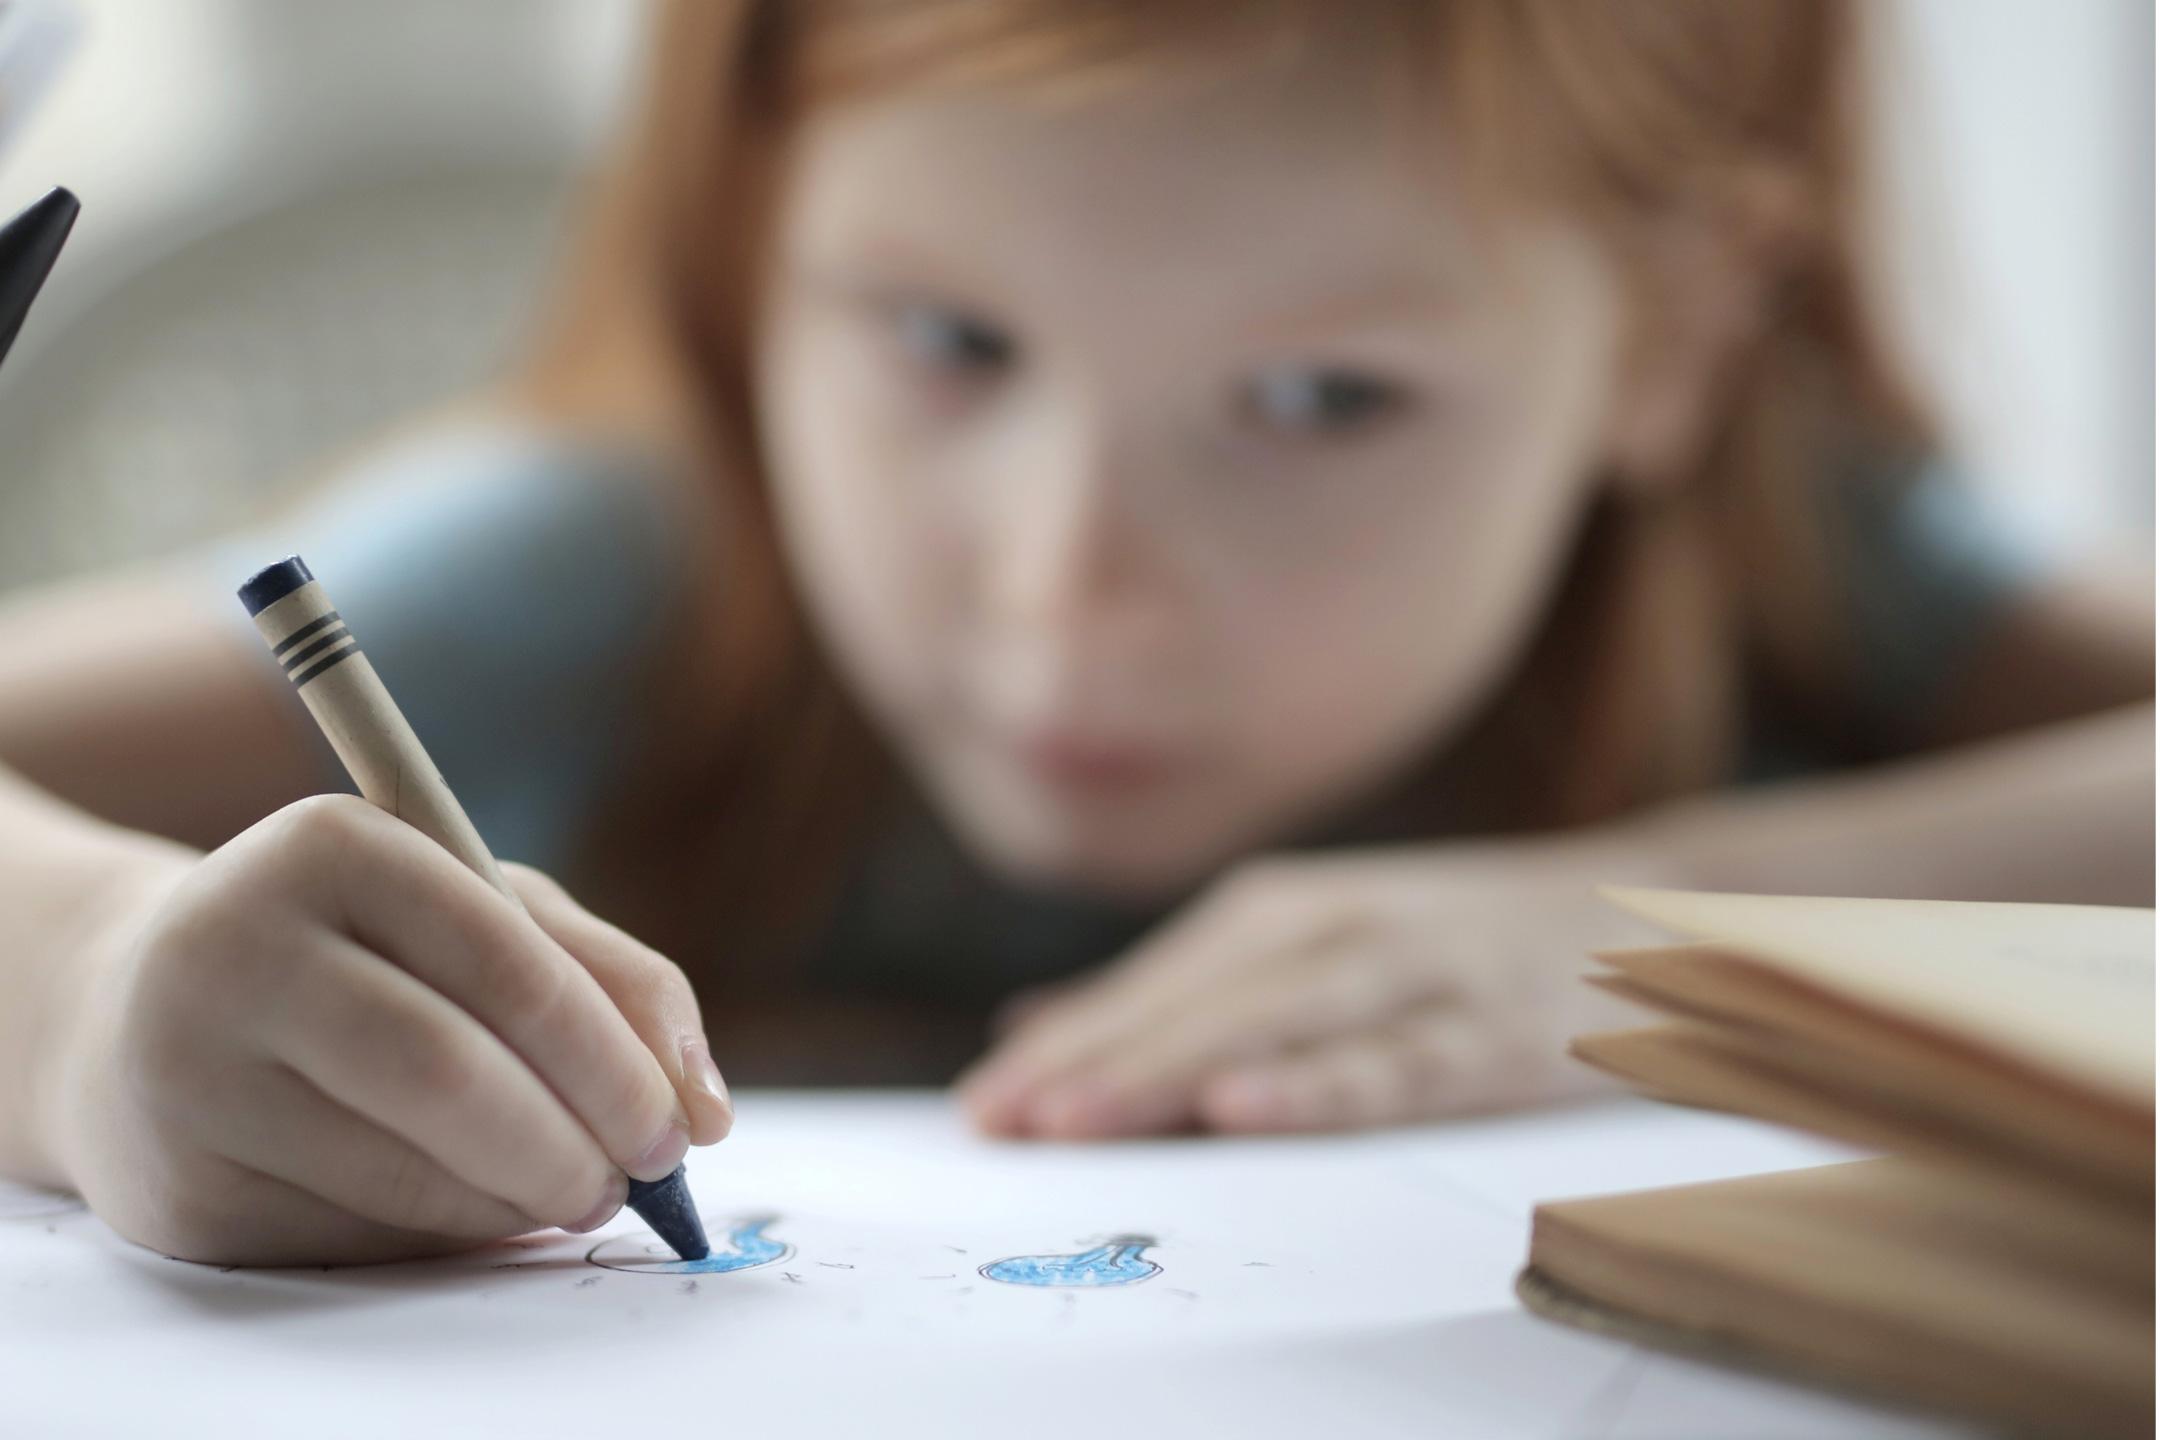 girl-drawing-crayon2160